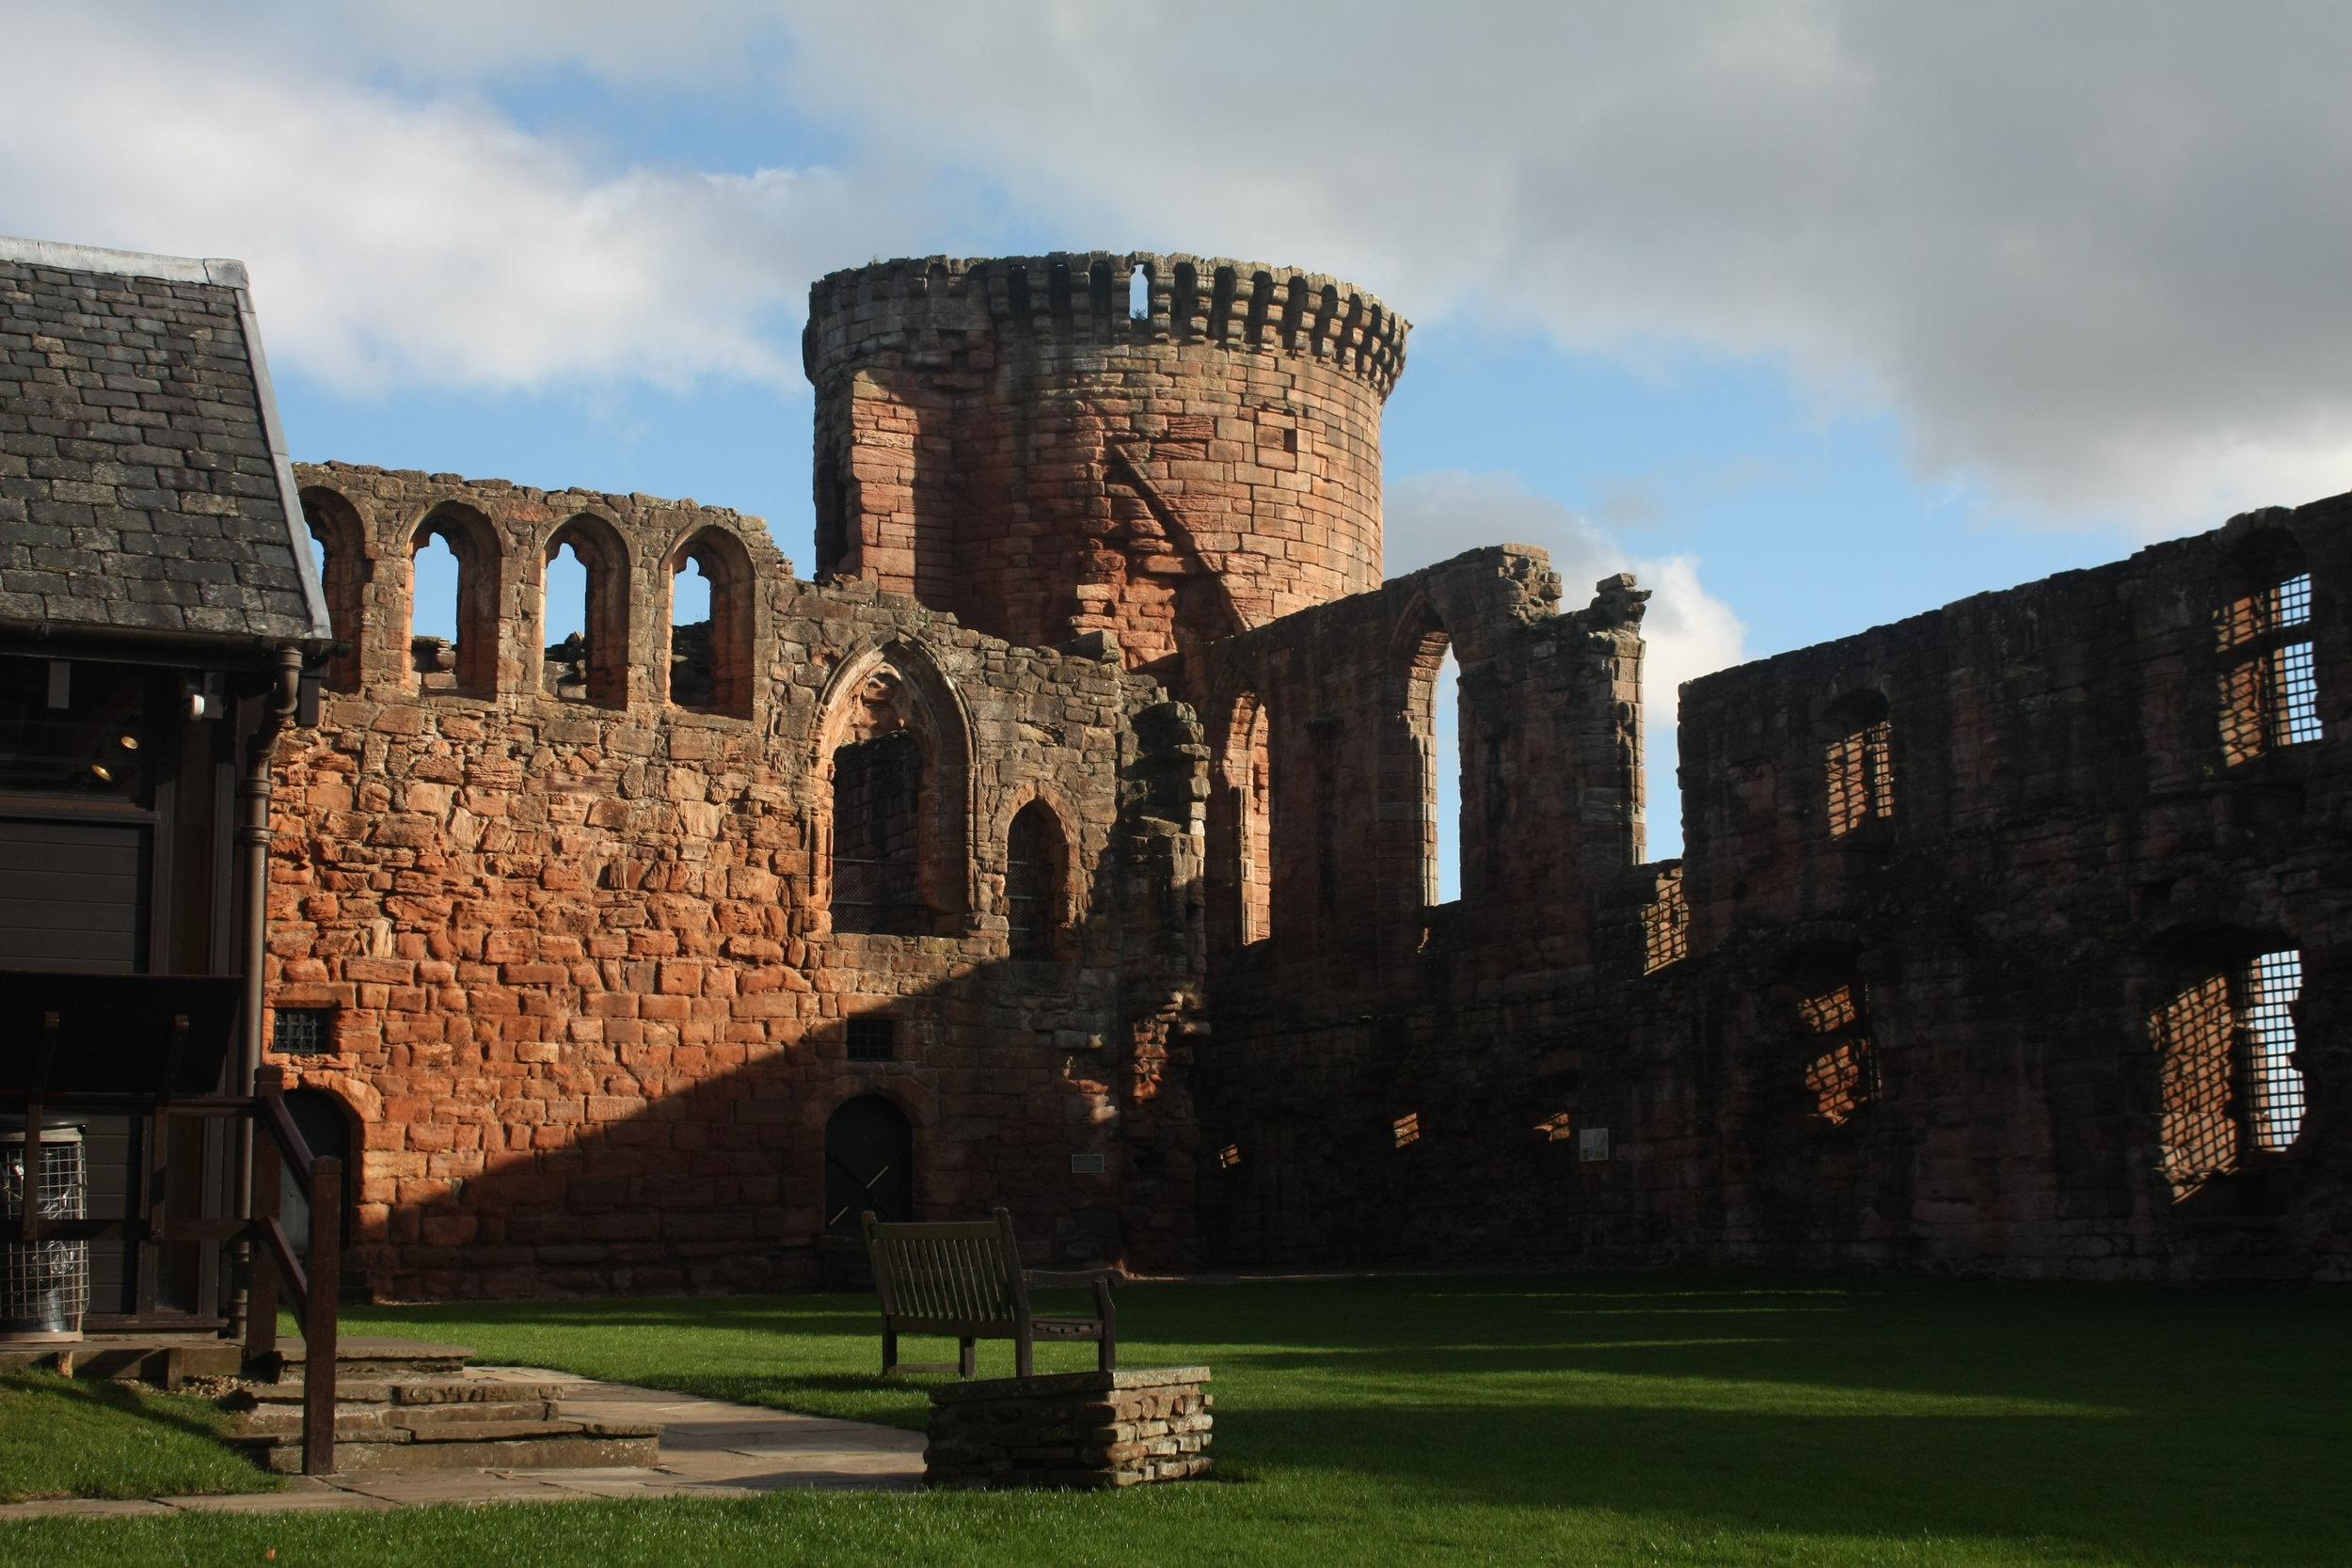 Interior of Bothwell Castle